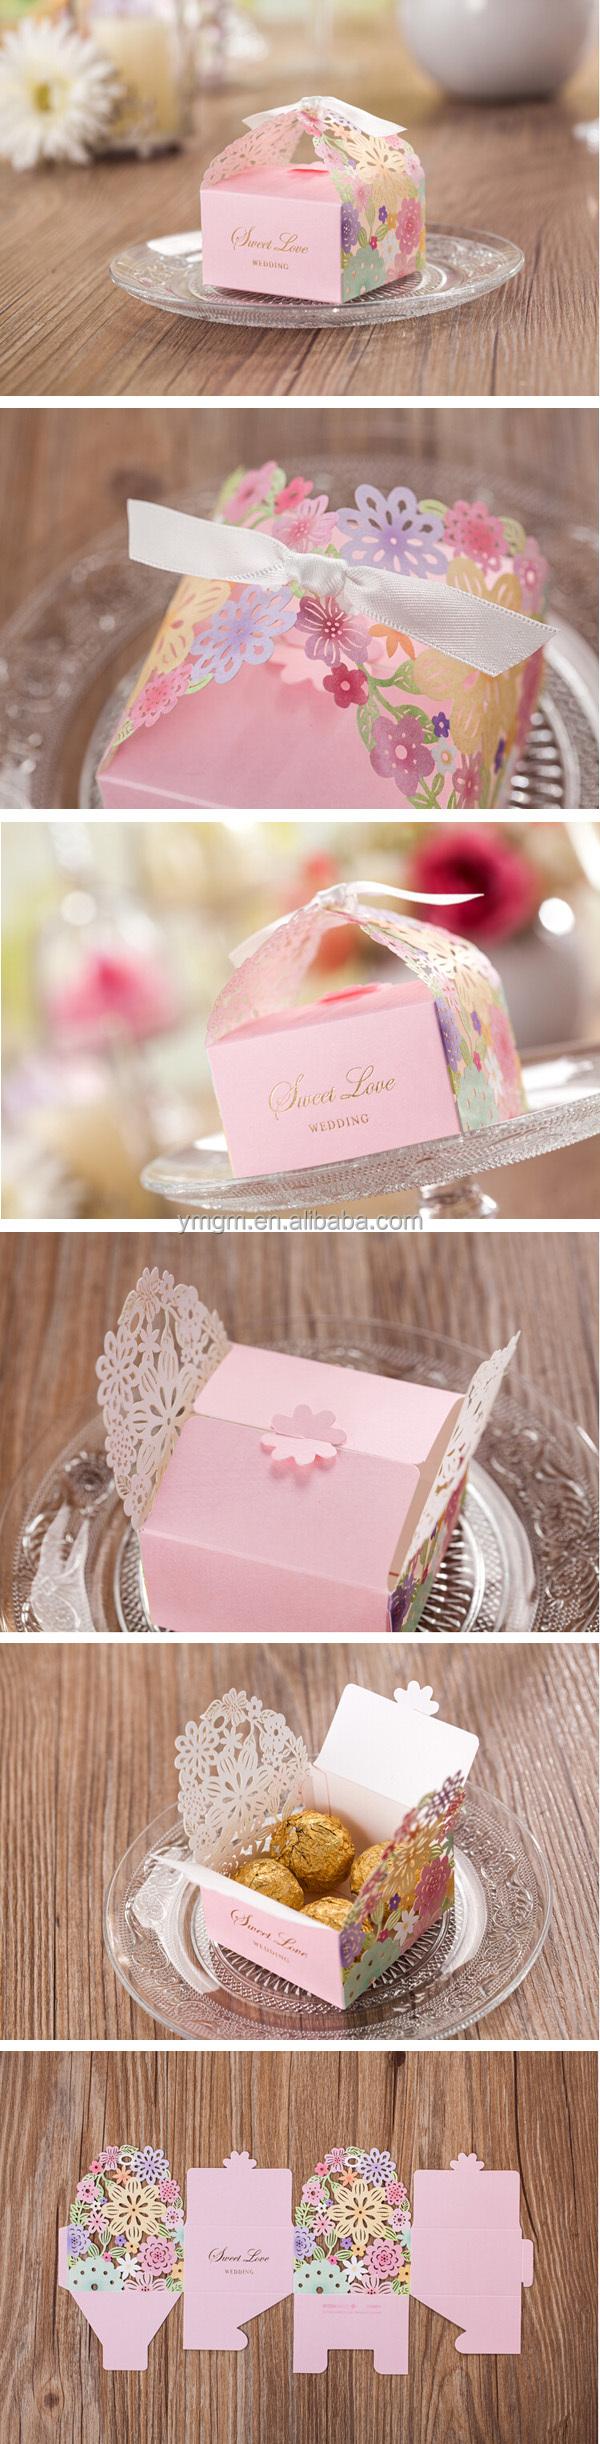 Wholesale Laser Cut Luxury Wedding Invitation Box For Chocolate ...